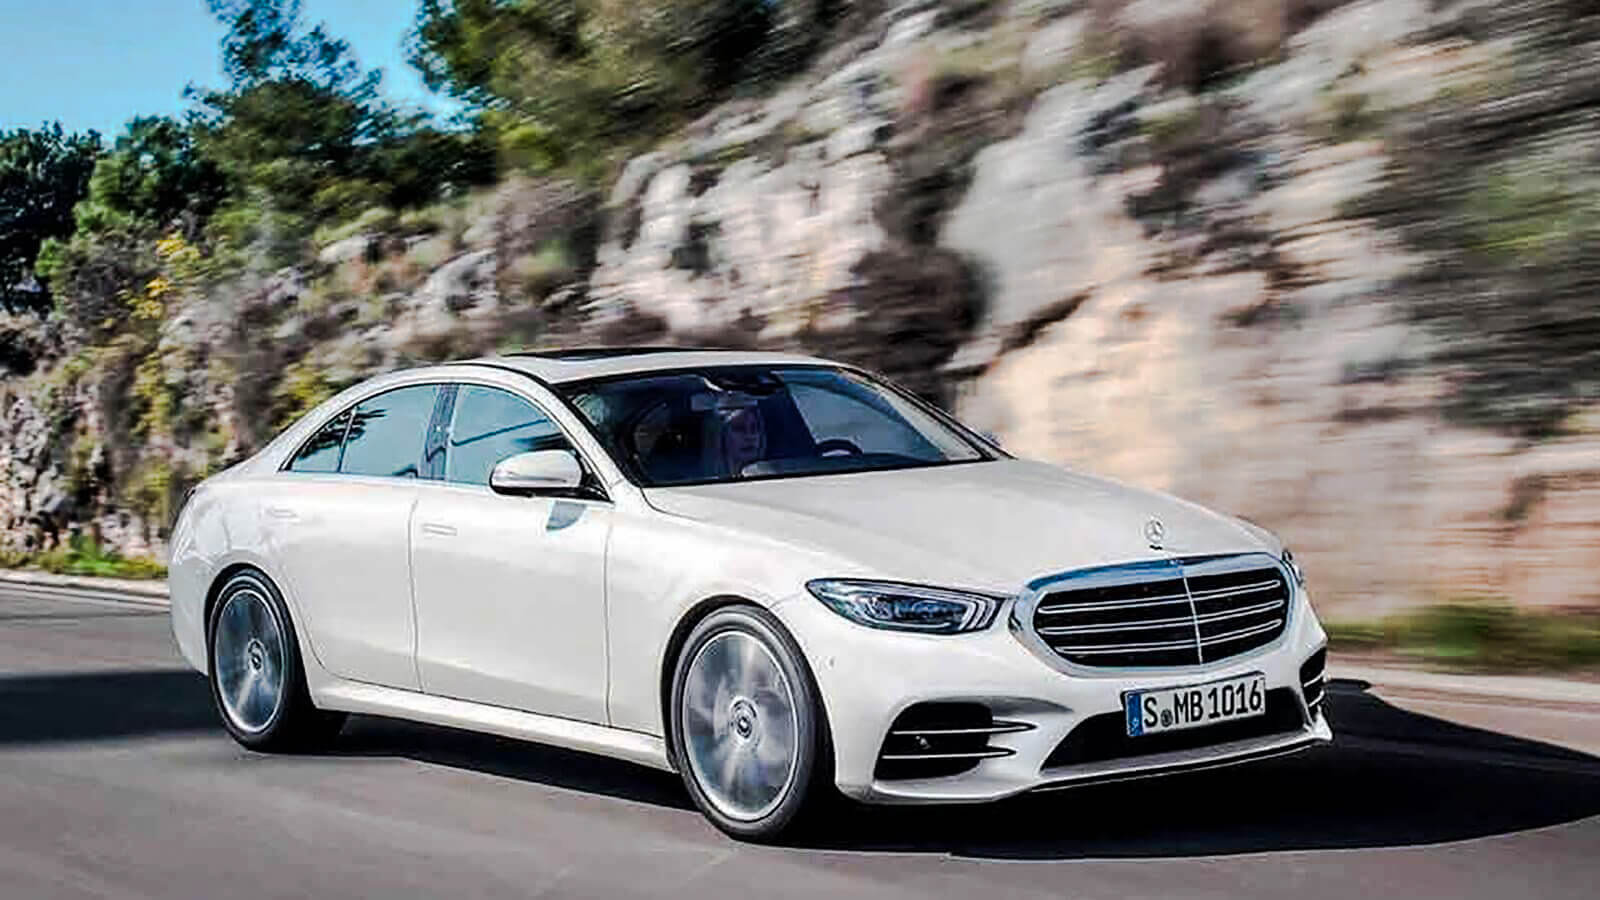 S Mercedes